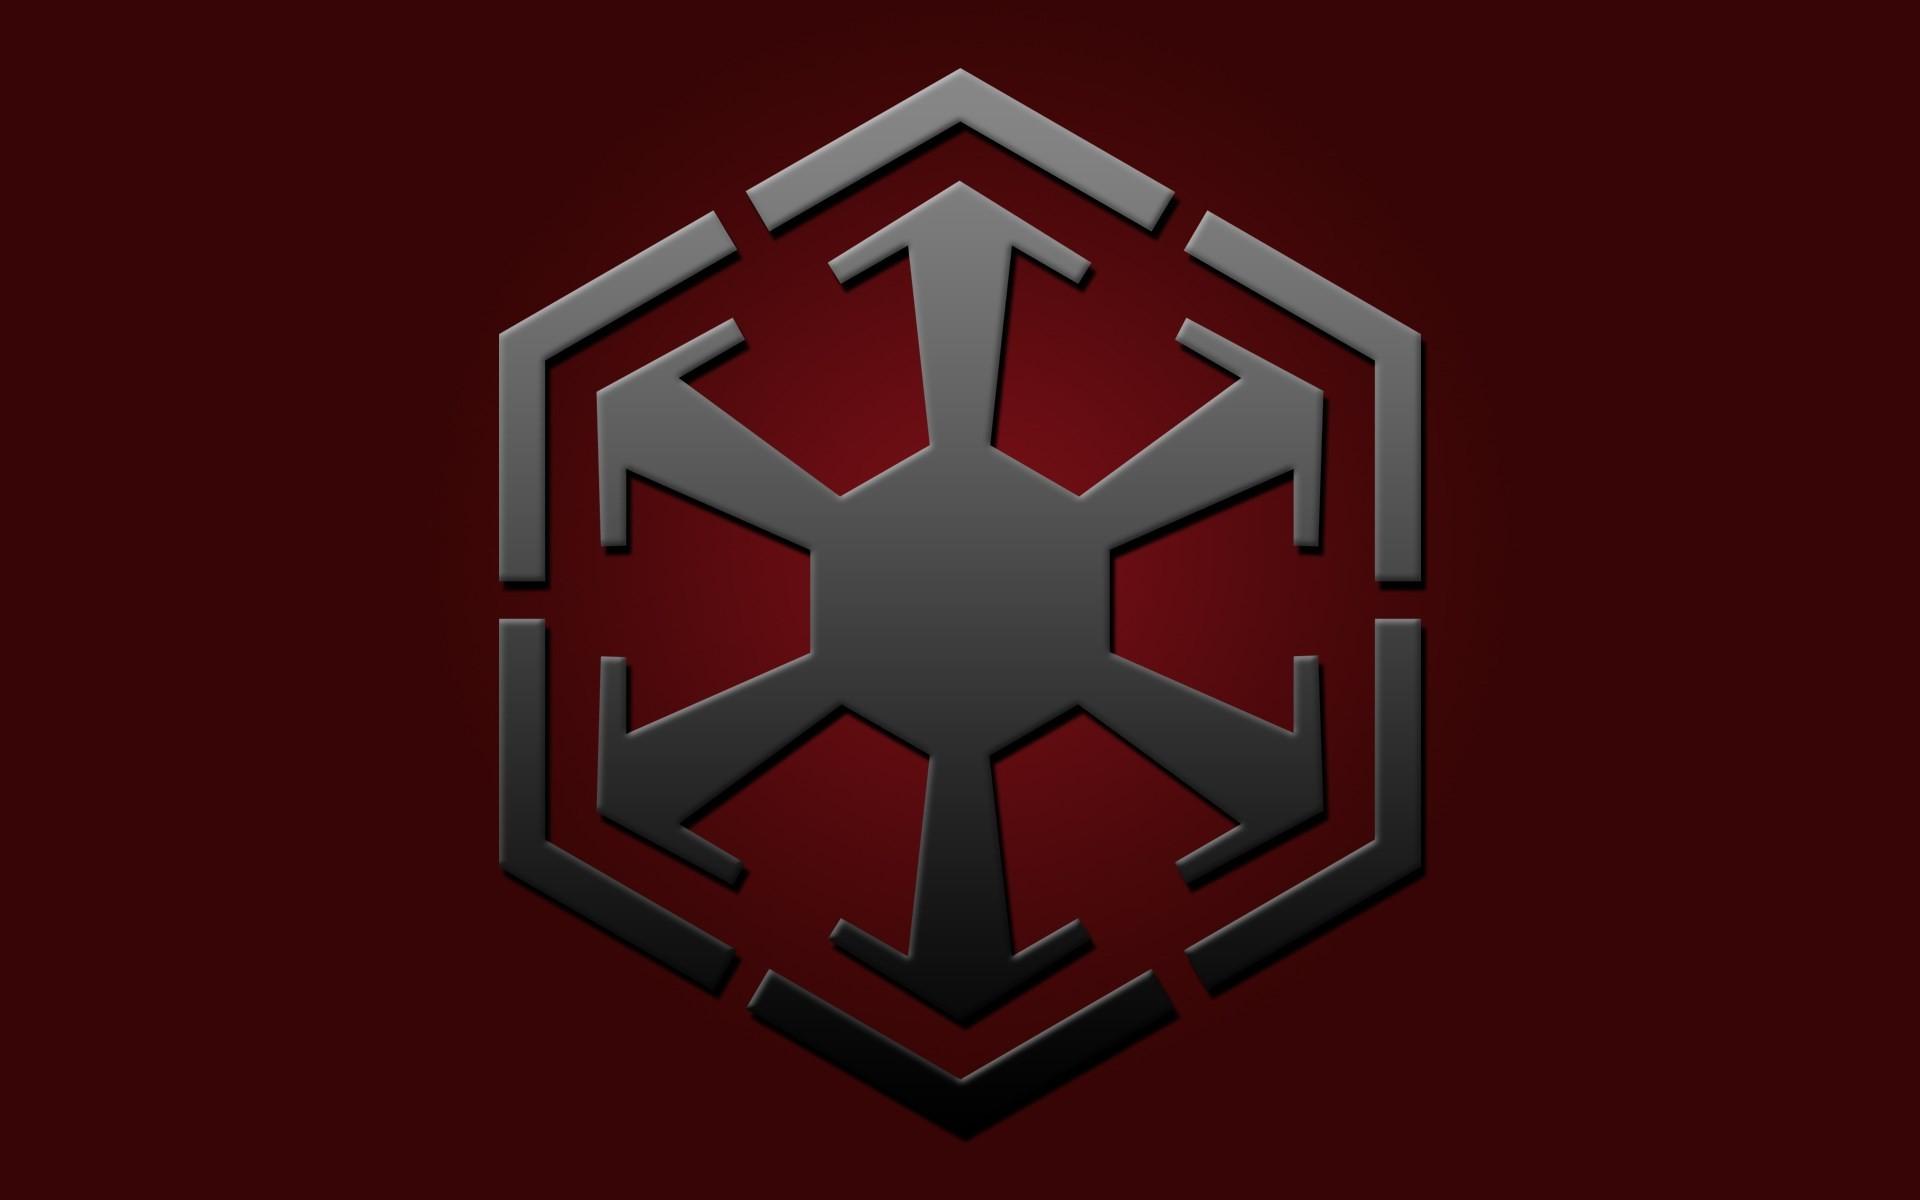 sith logo iphone wallpaper …